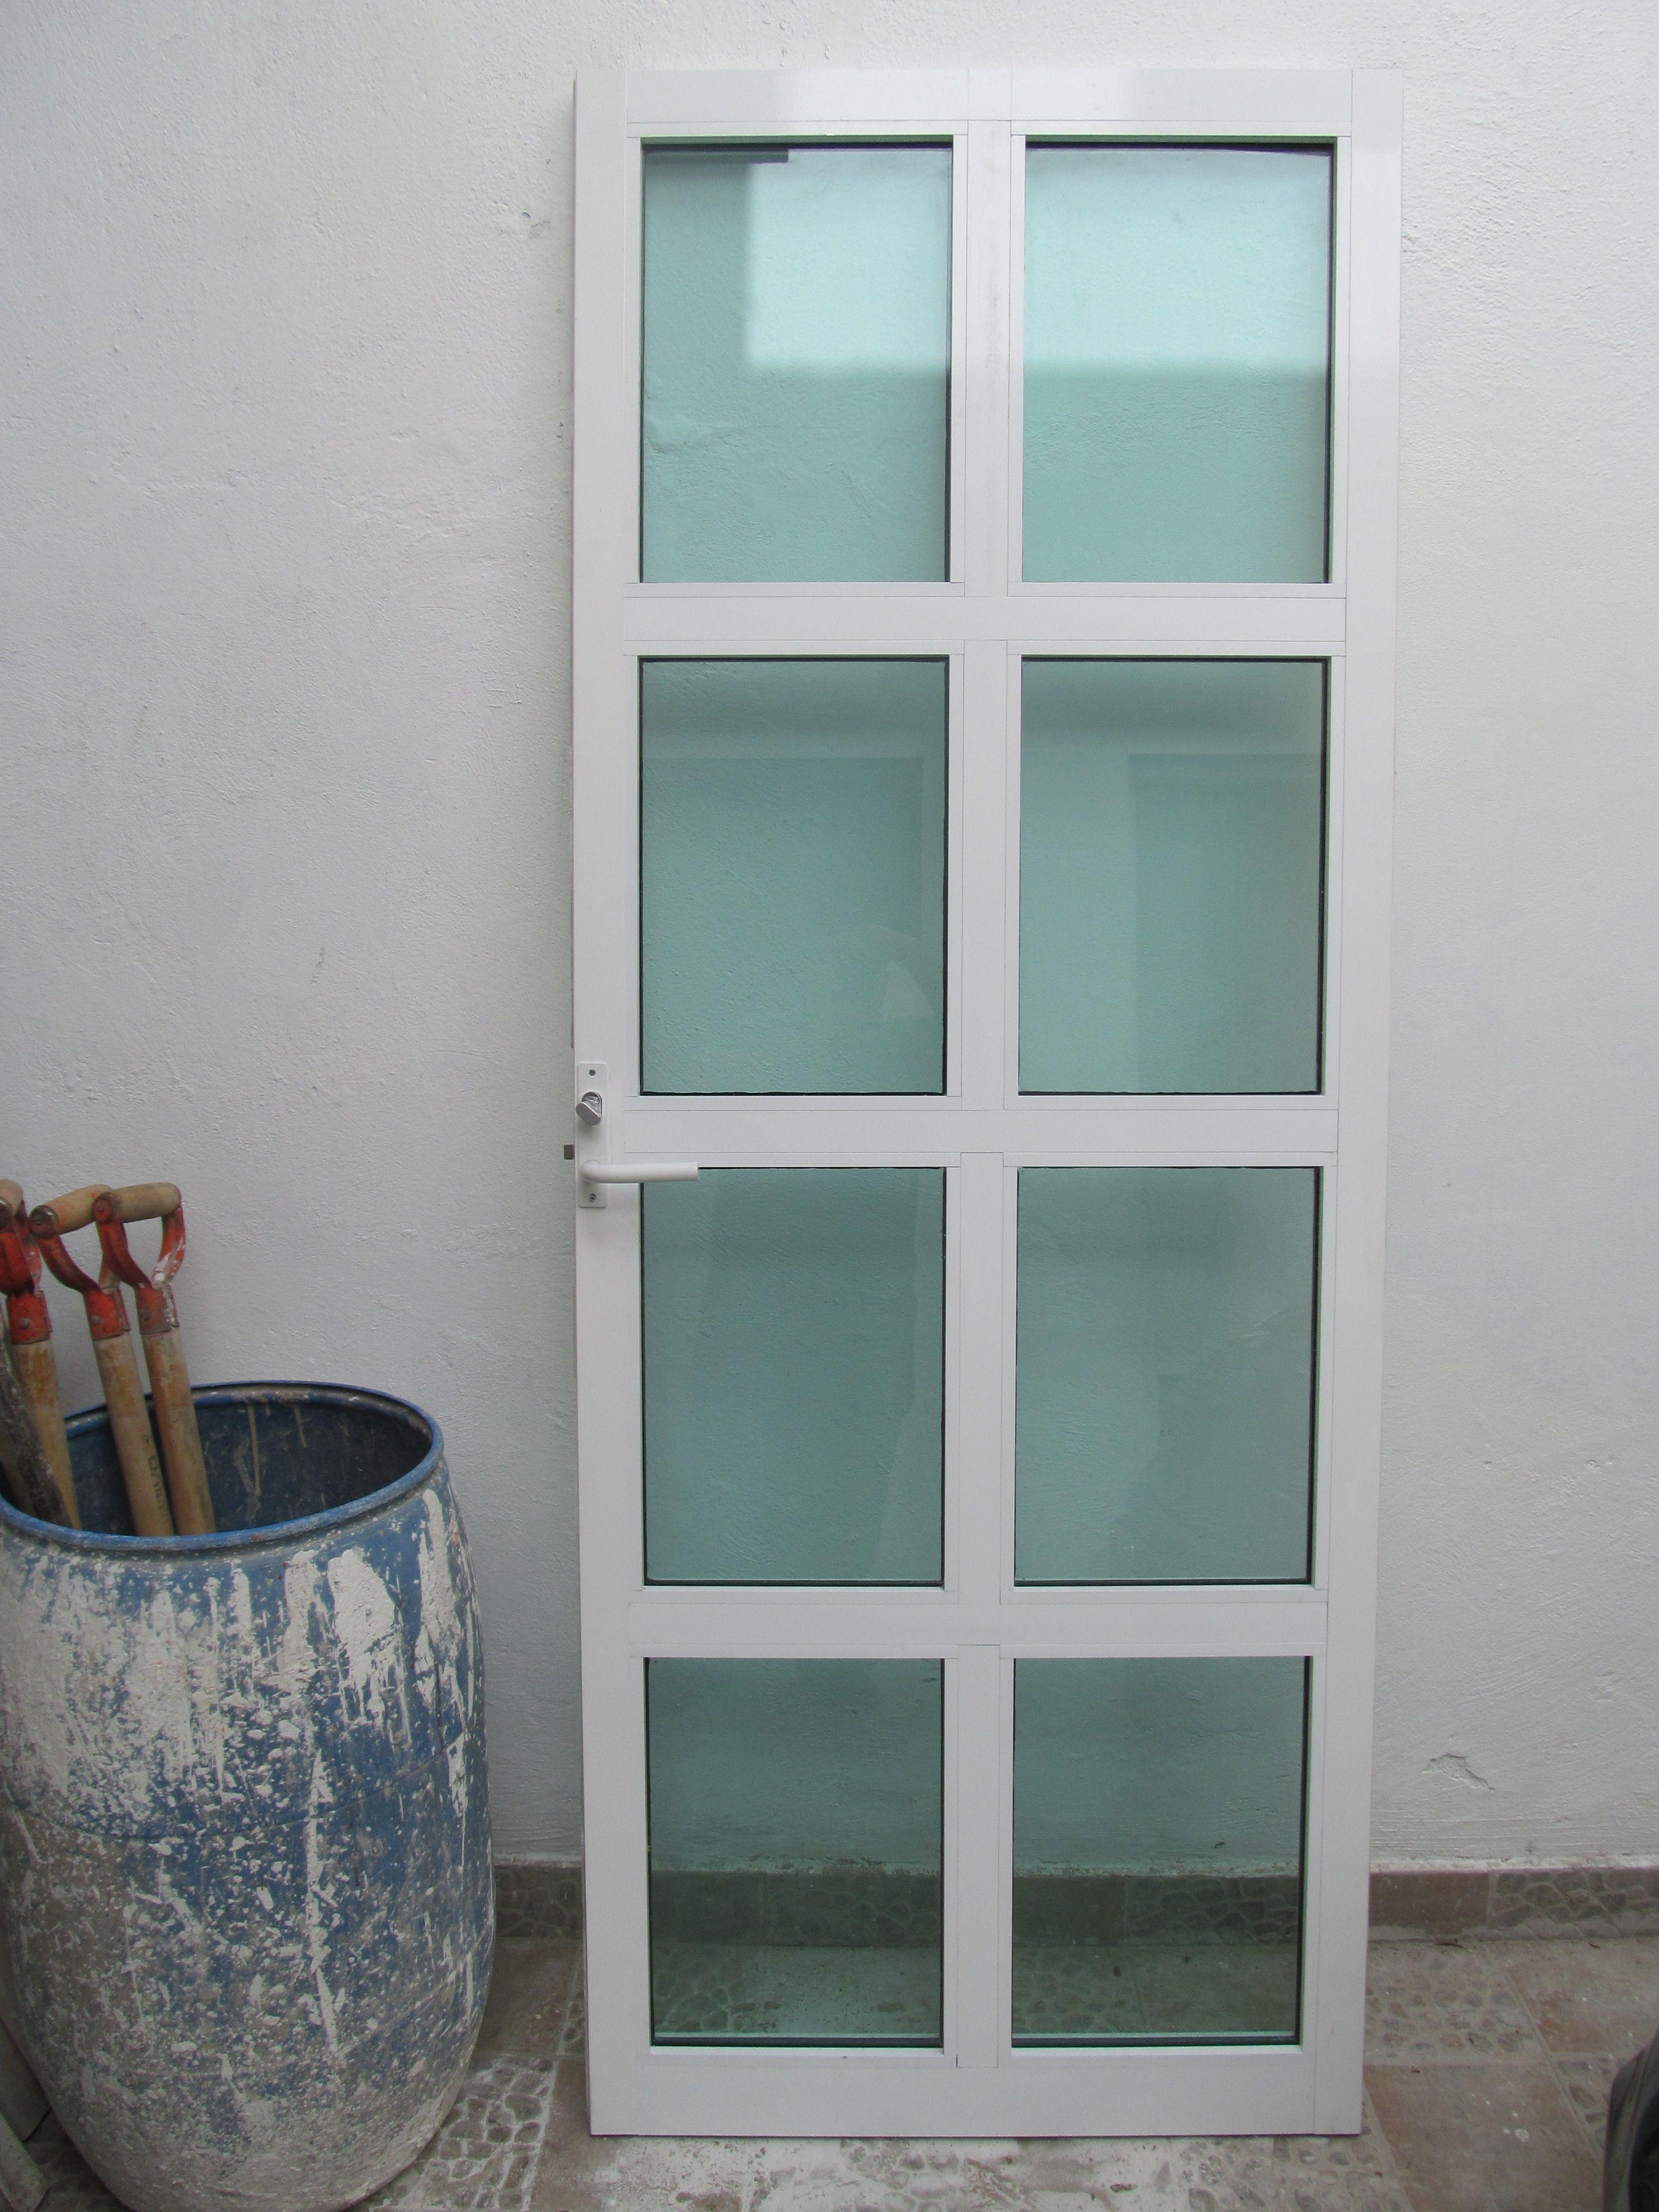 Puerta de aluminio recamara pinterest puertas de - Puertas de aluminio exteriores ...